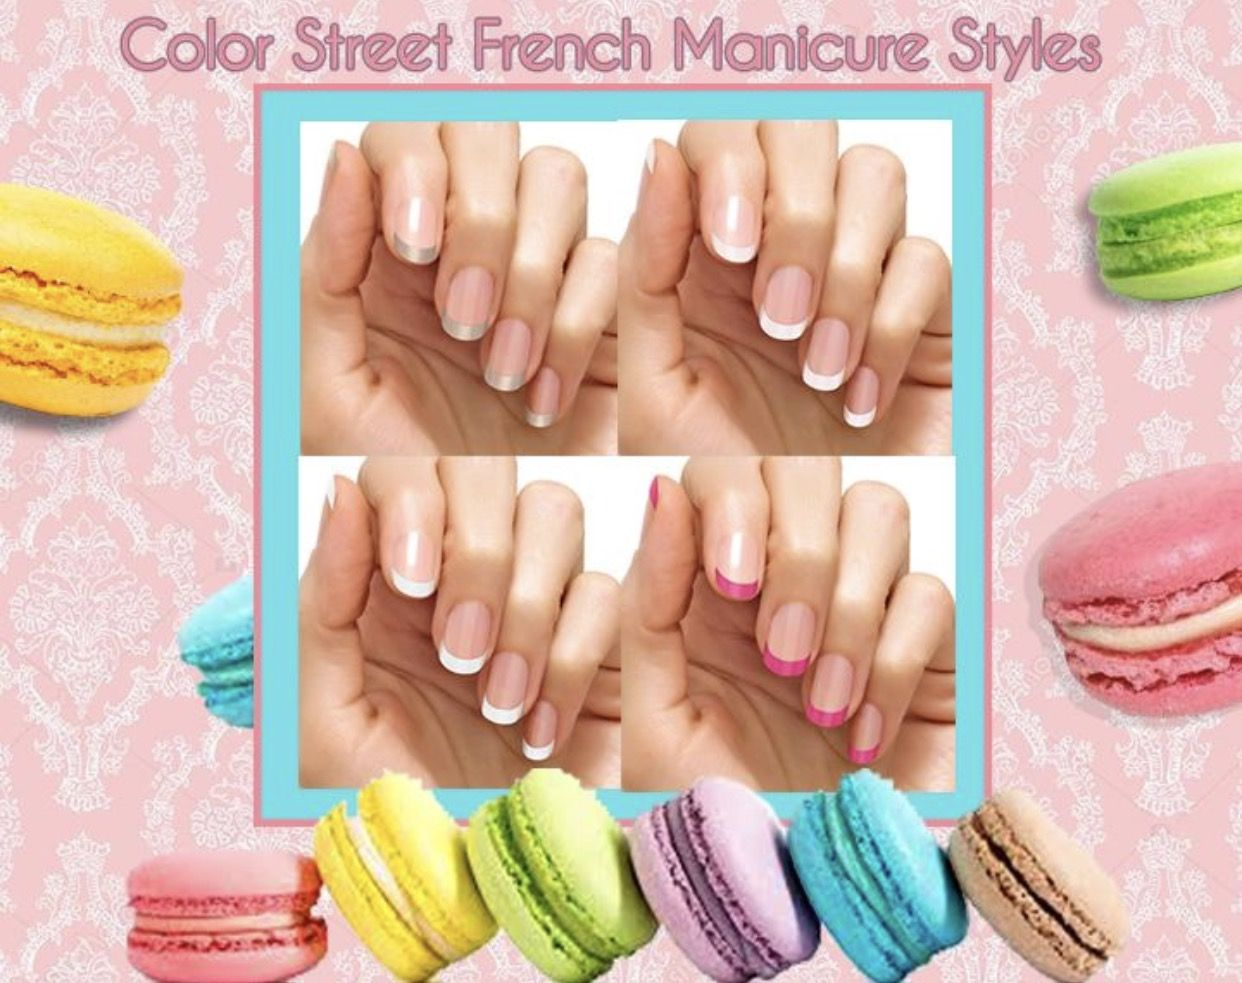 Pin by Laura John on Color STREET Nail Polish Strips   Pinterest ...